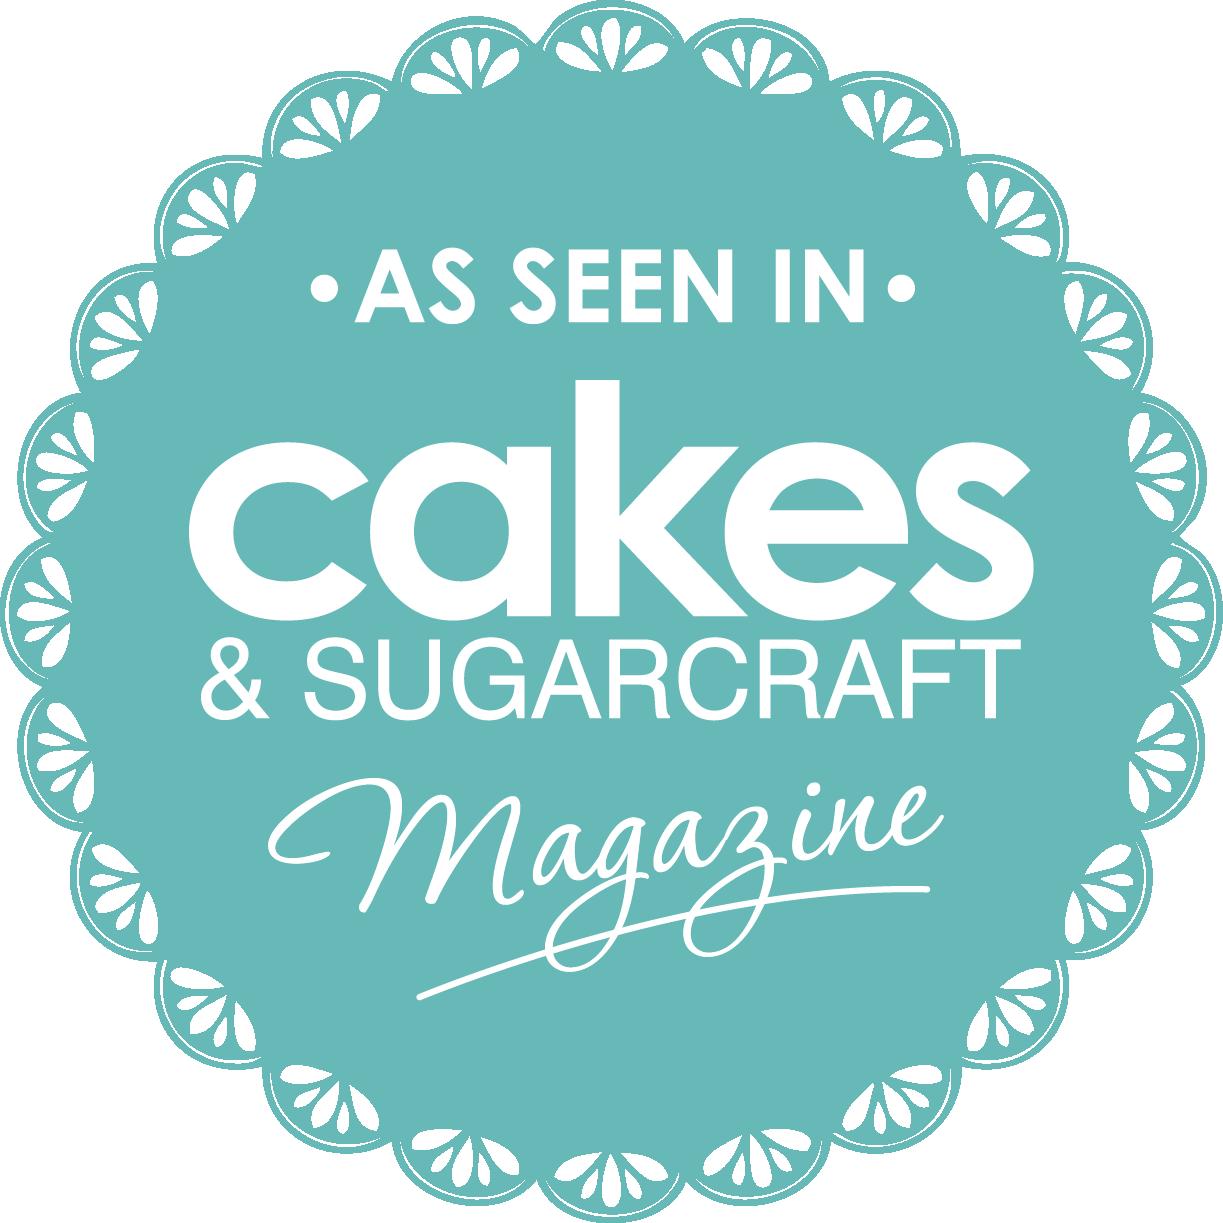 As seen in Wedding Cakes Magazine - Emily Hankins Cakes